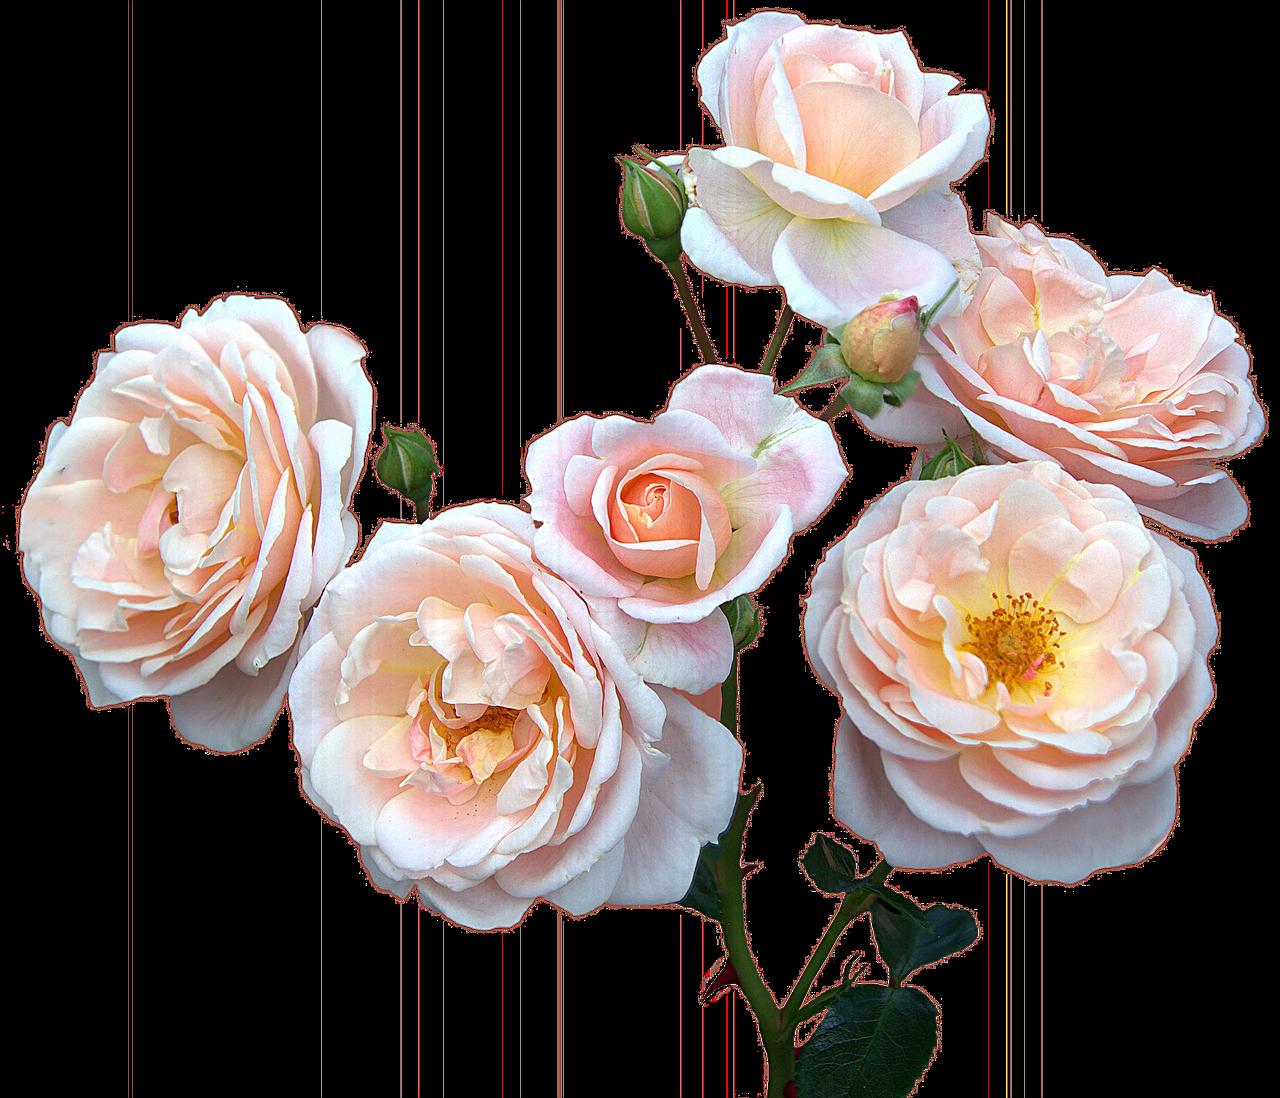 Roses Freemothers Daywomens Dayflowersbouquet Free Photo